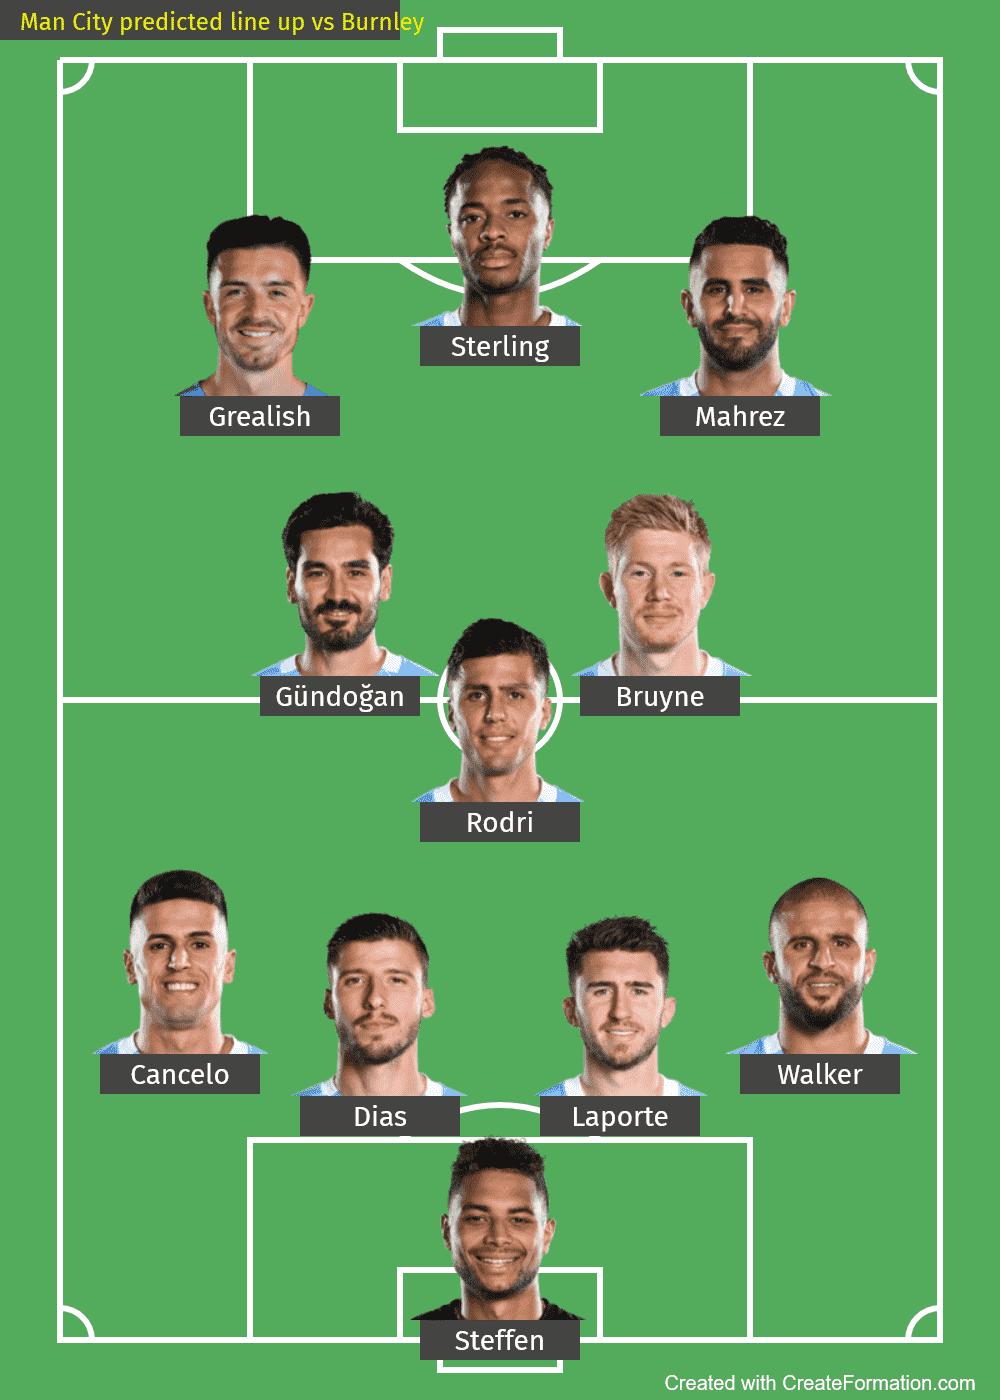 Man City predicted line up vs Burnley